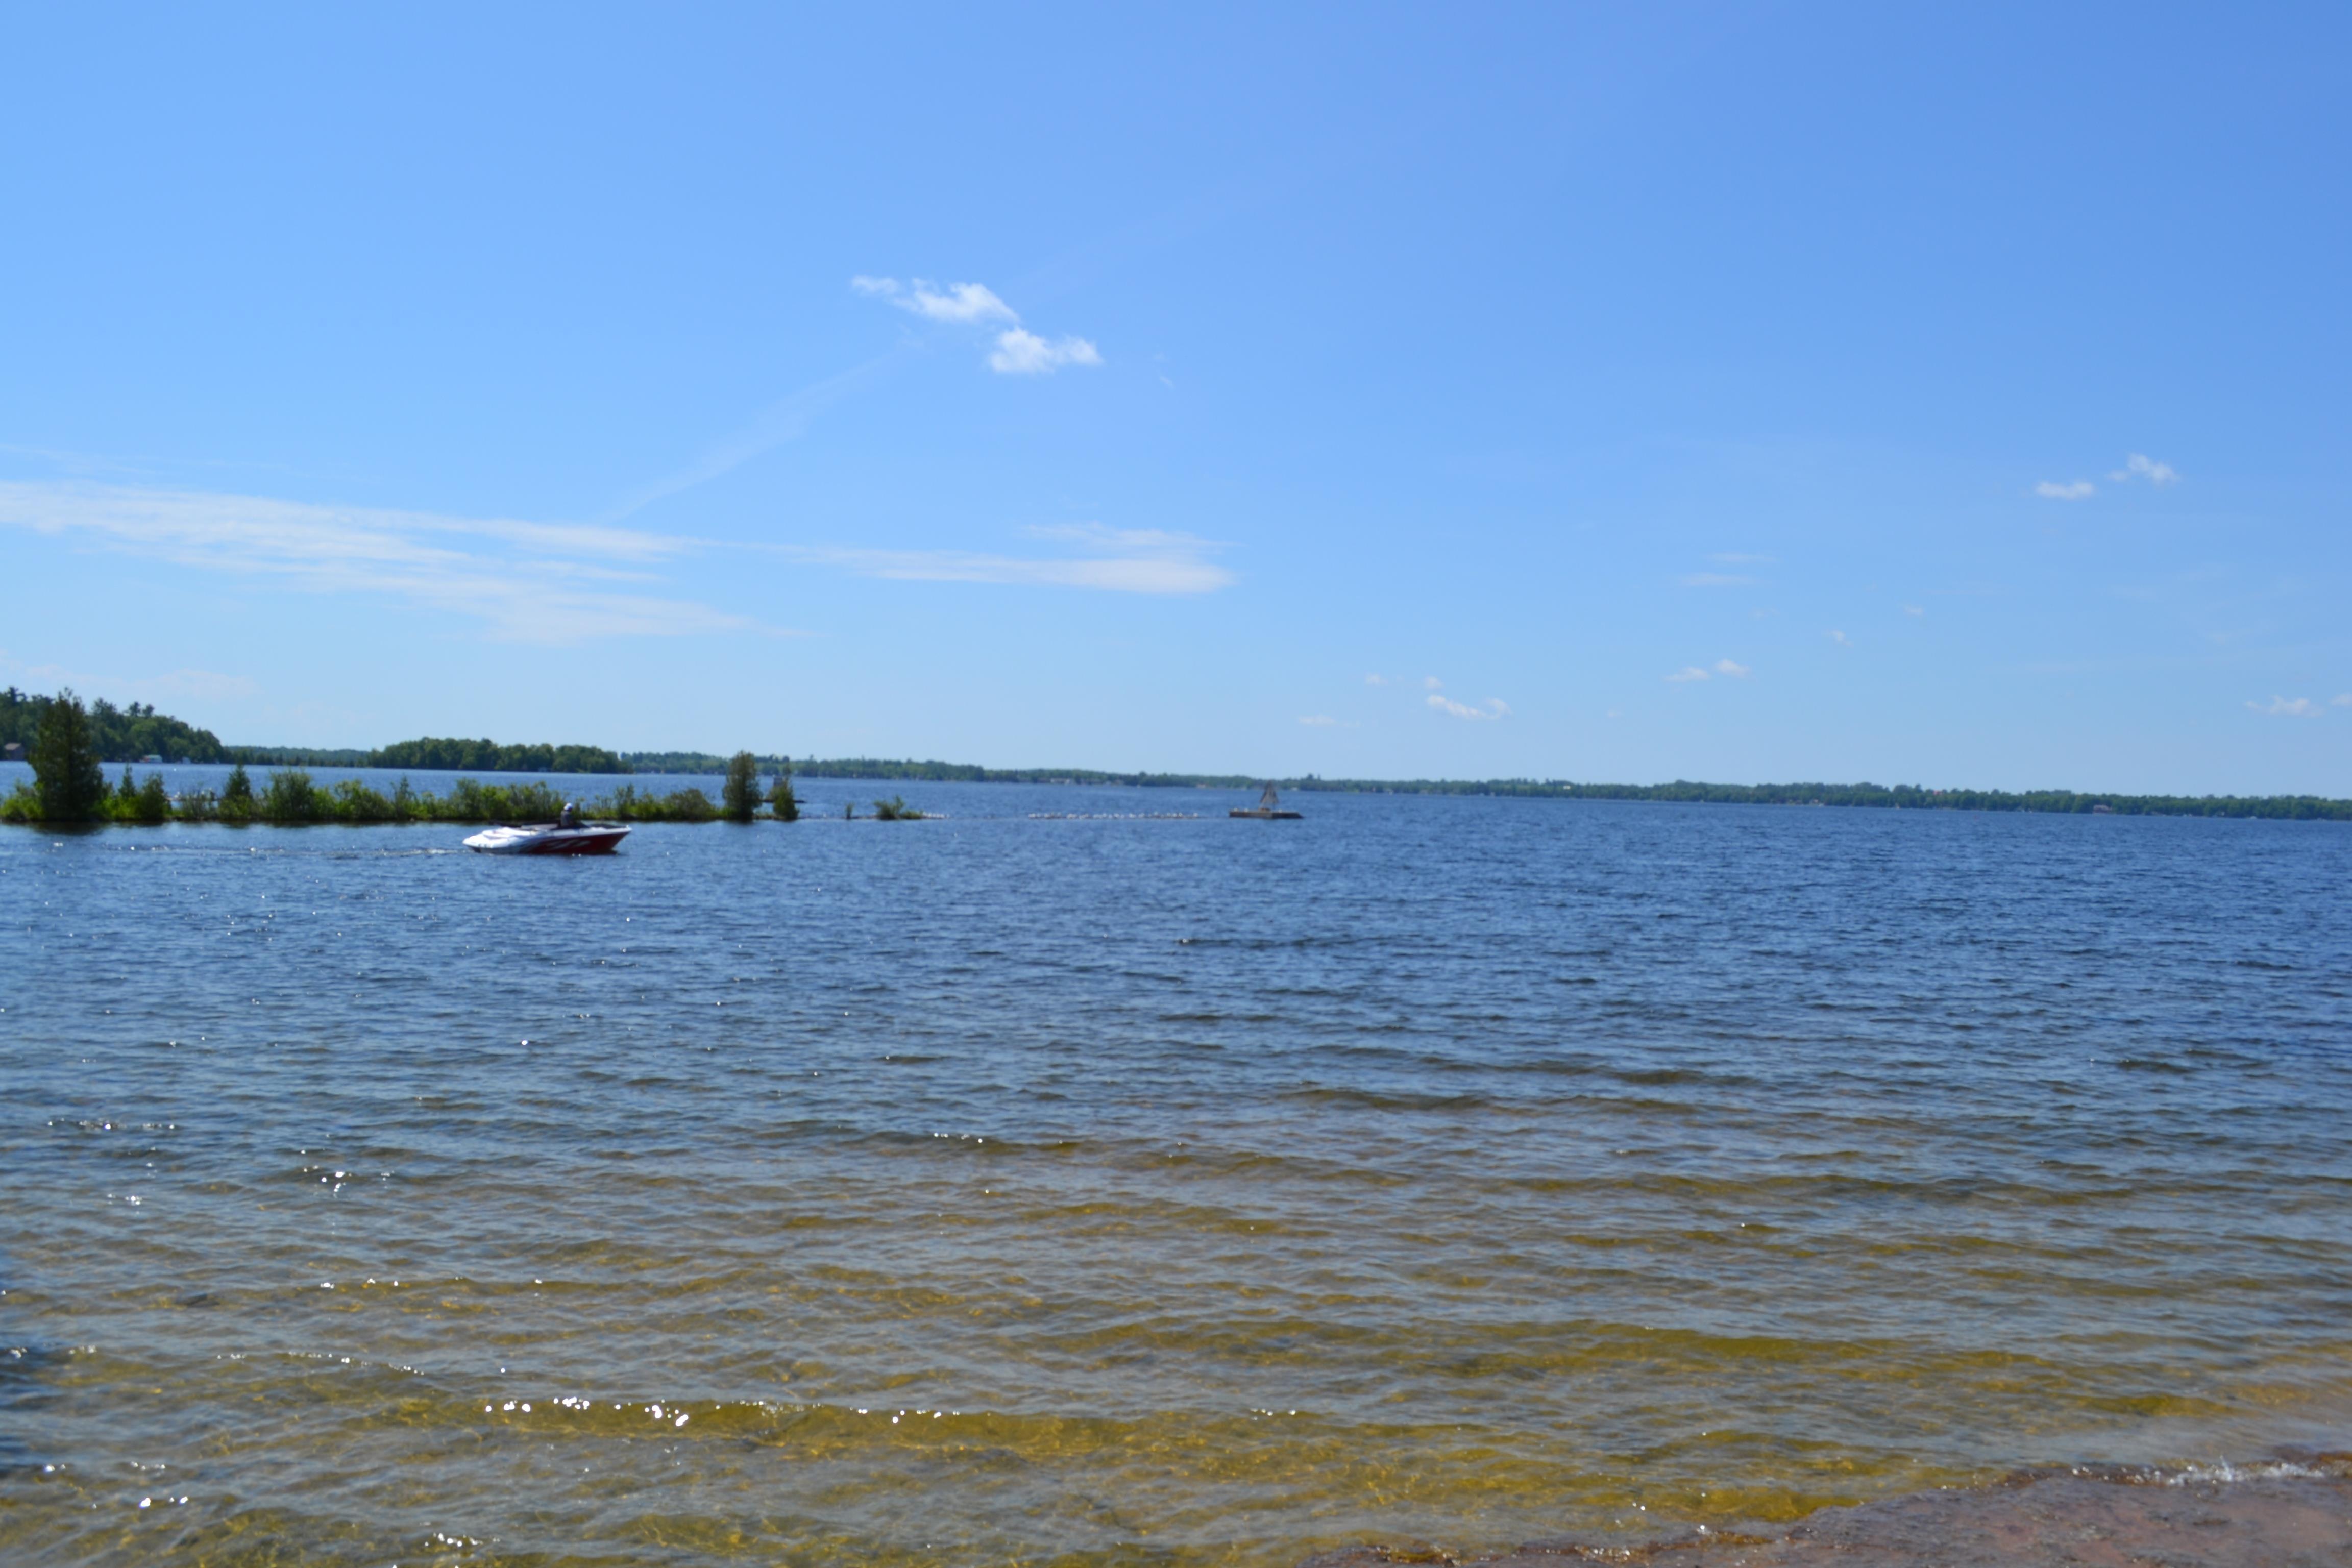 Cameron Lake - Fenelon Falls Real Estate - Brad Nelson - kawarthabrad